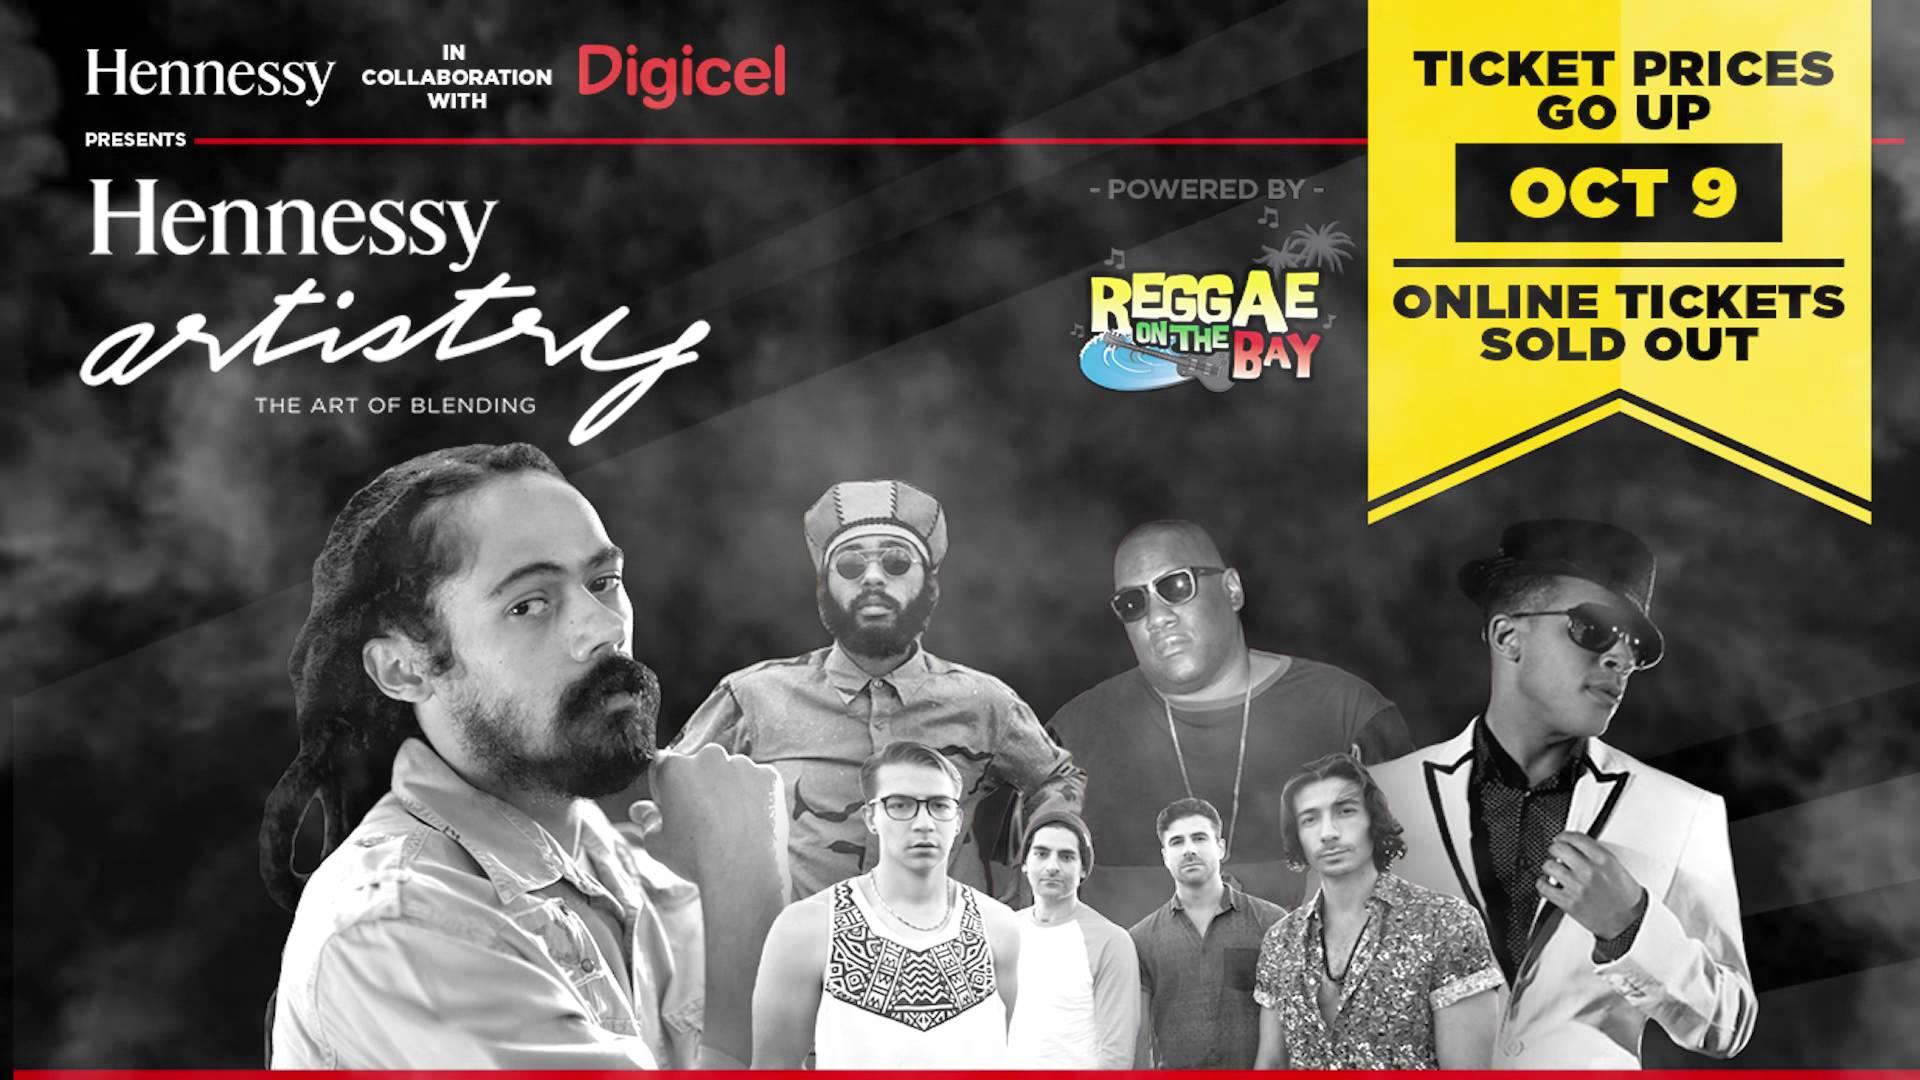 Reggae On The Bay 2015 (Ad) [10/14/2015]